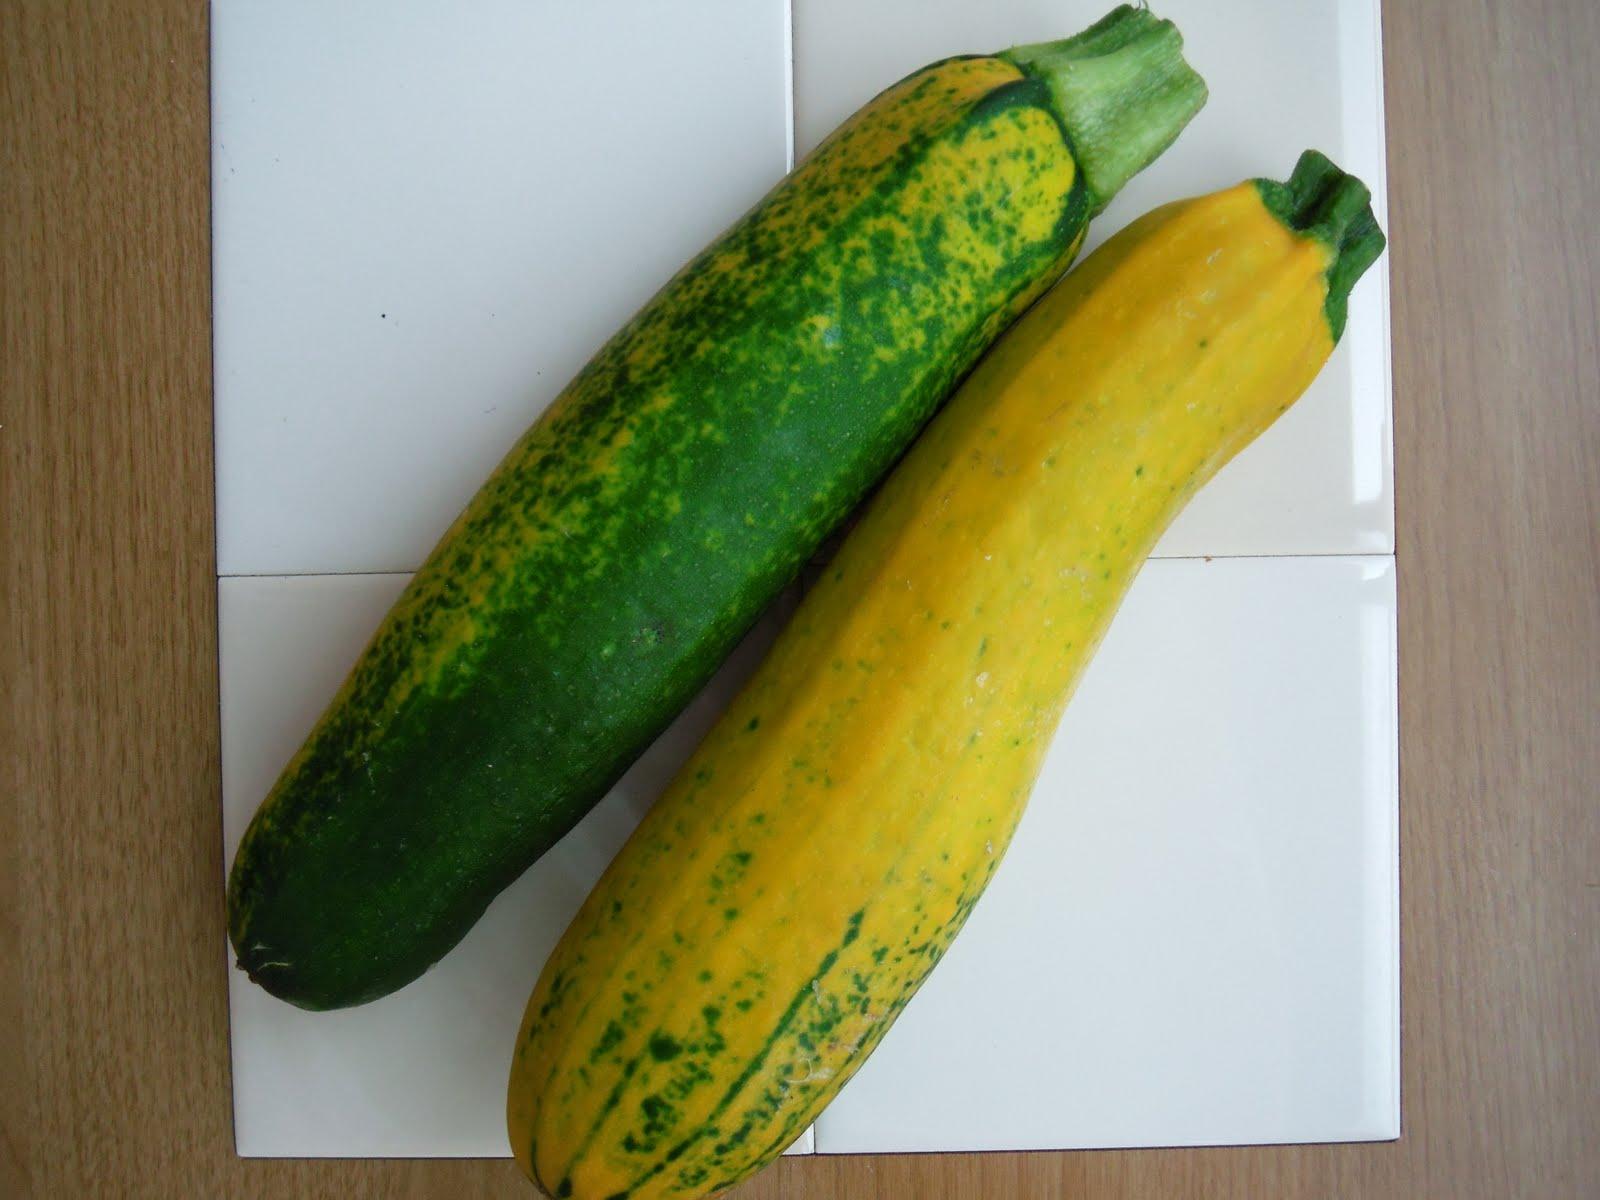 OISHINESS: Yellow Zucchini